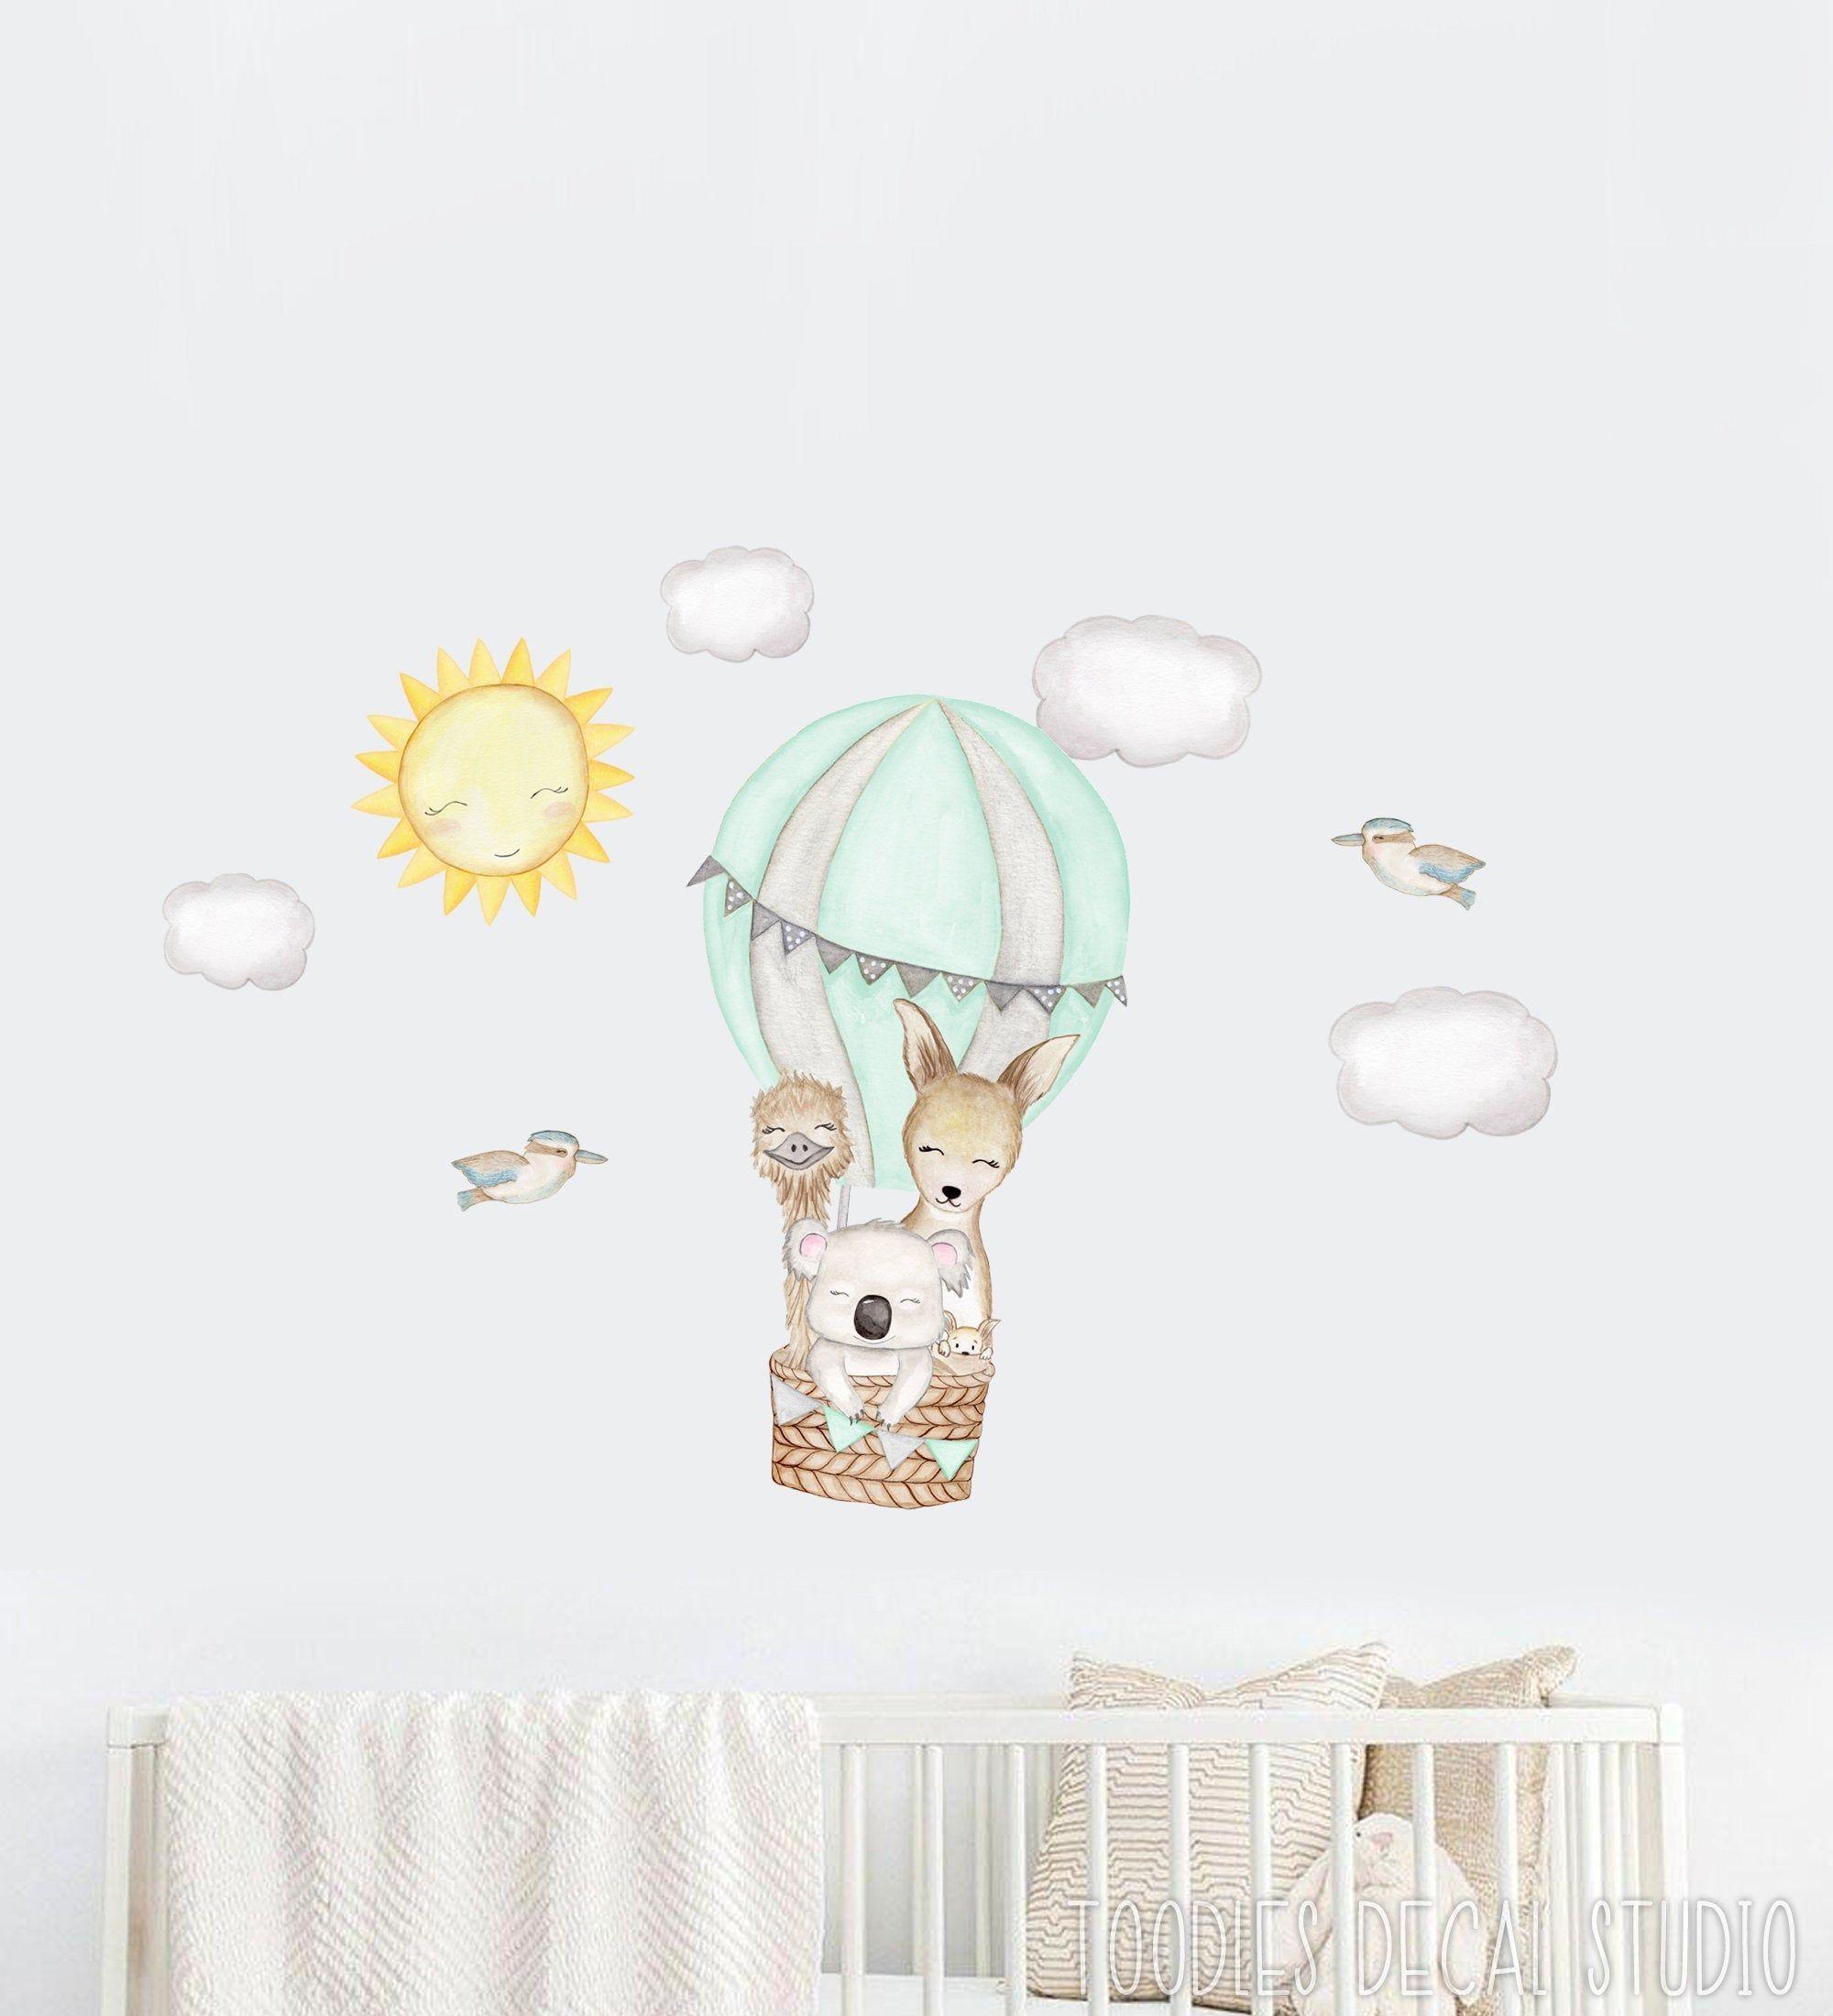 Watercolor Hot Air Balloon Decal Australian Animal Wall Stickers